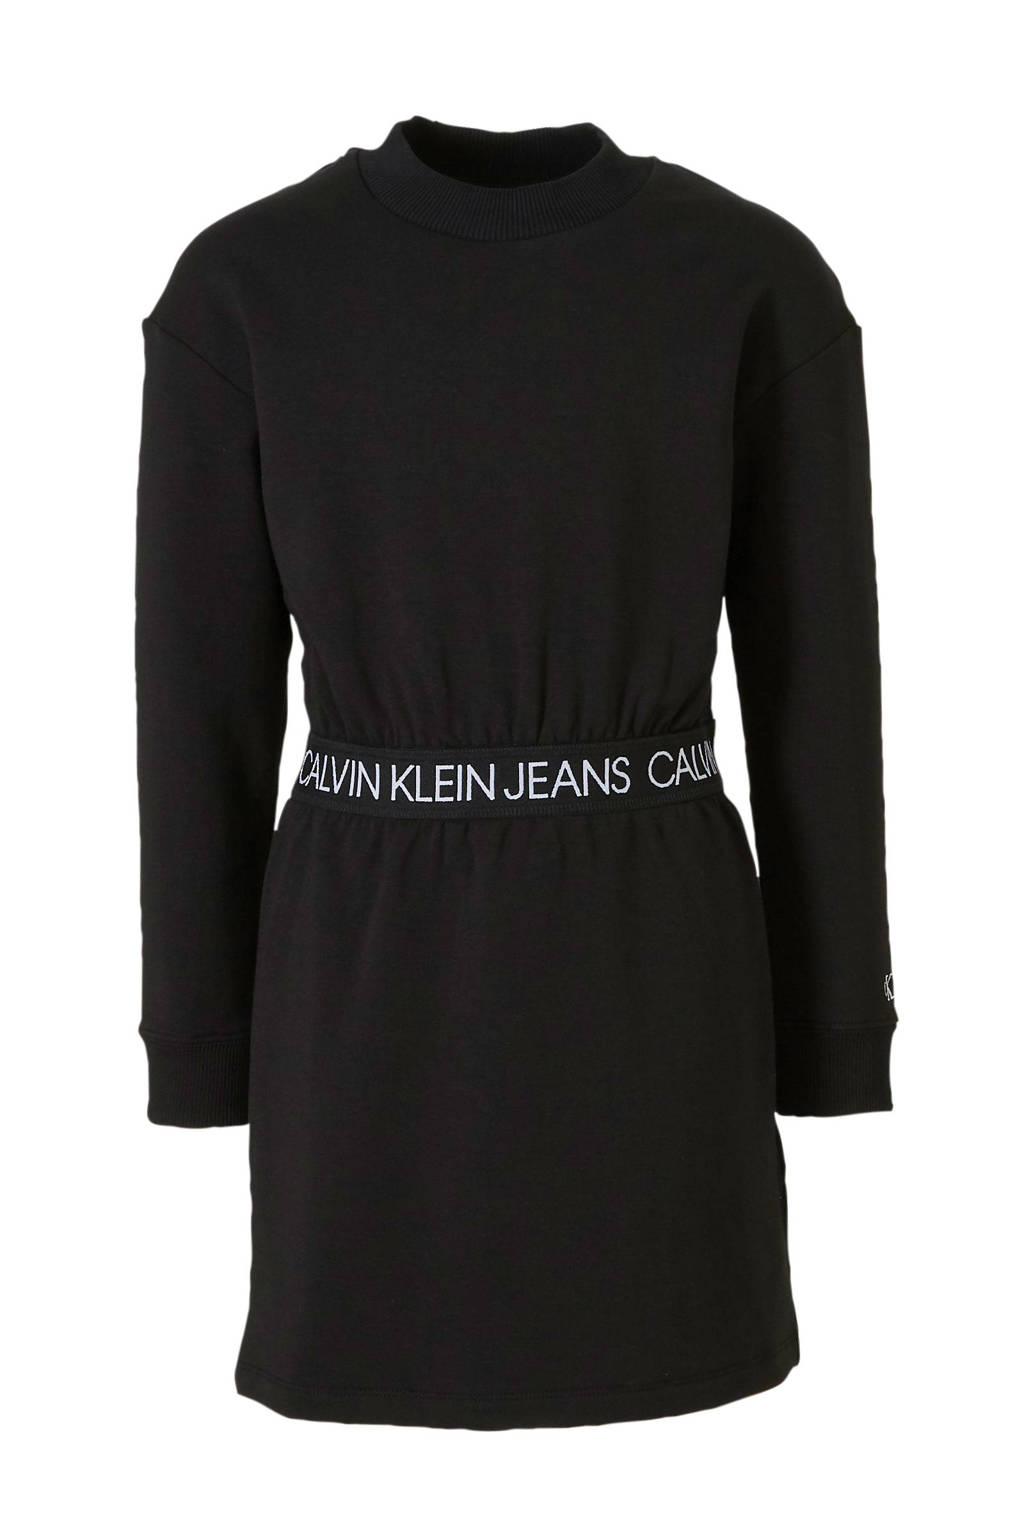 CALVIN KLEIN JEANS jersey jurk met tekst zwart, Zwart